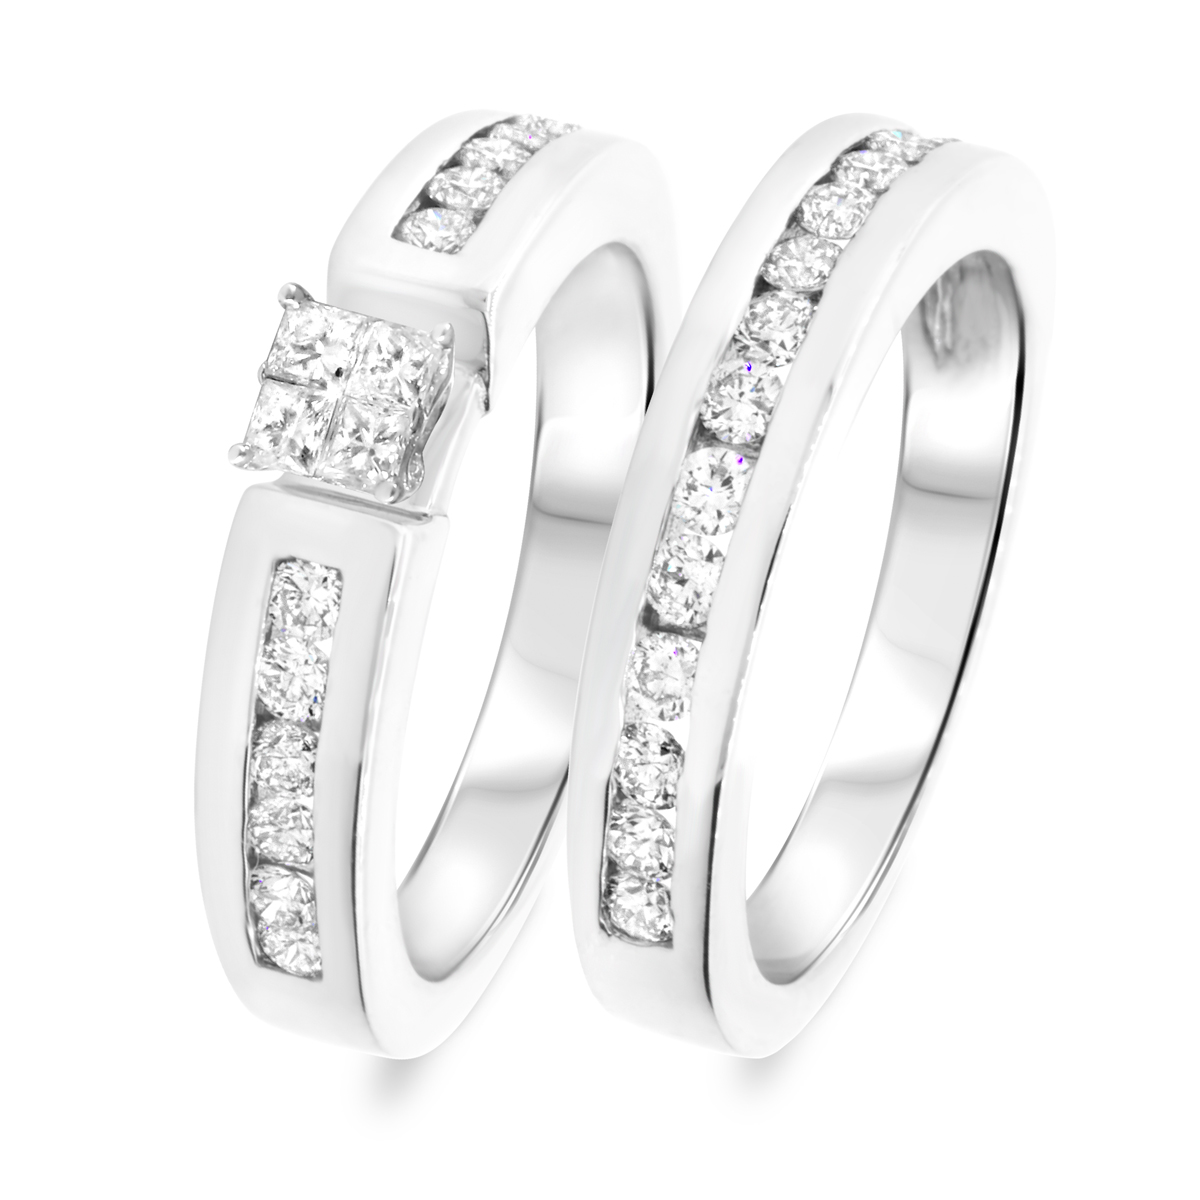 1 1/7 CT. T.W. Diamond Women's Bridal Wedding Ring Set 10K White Gold